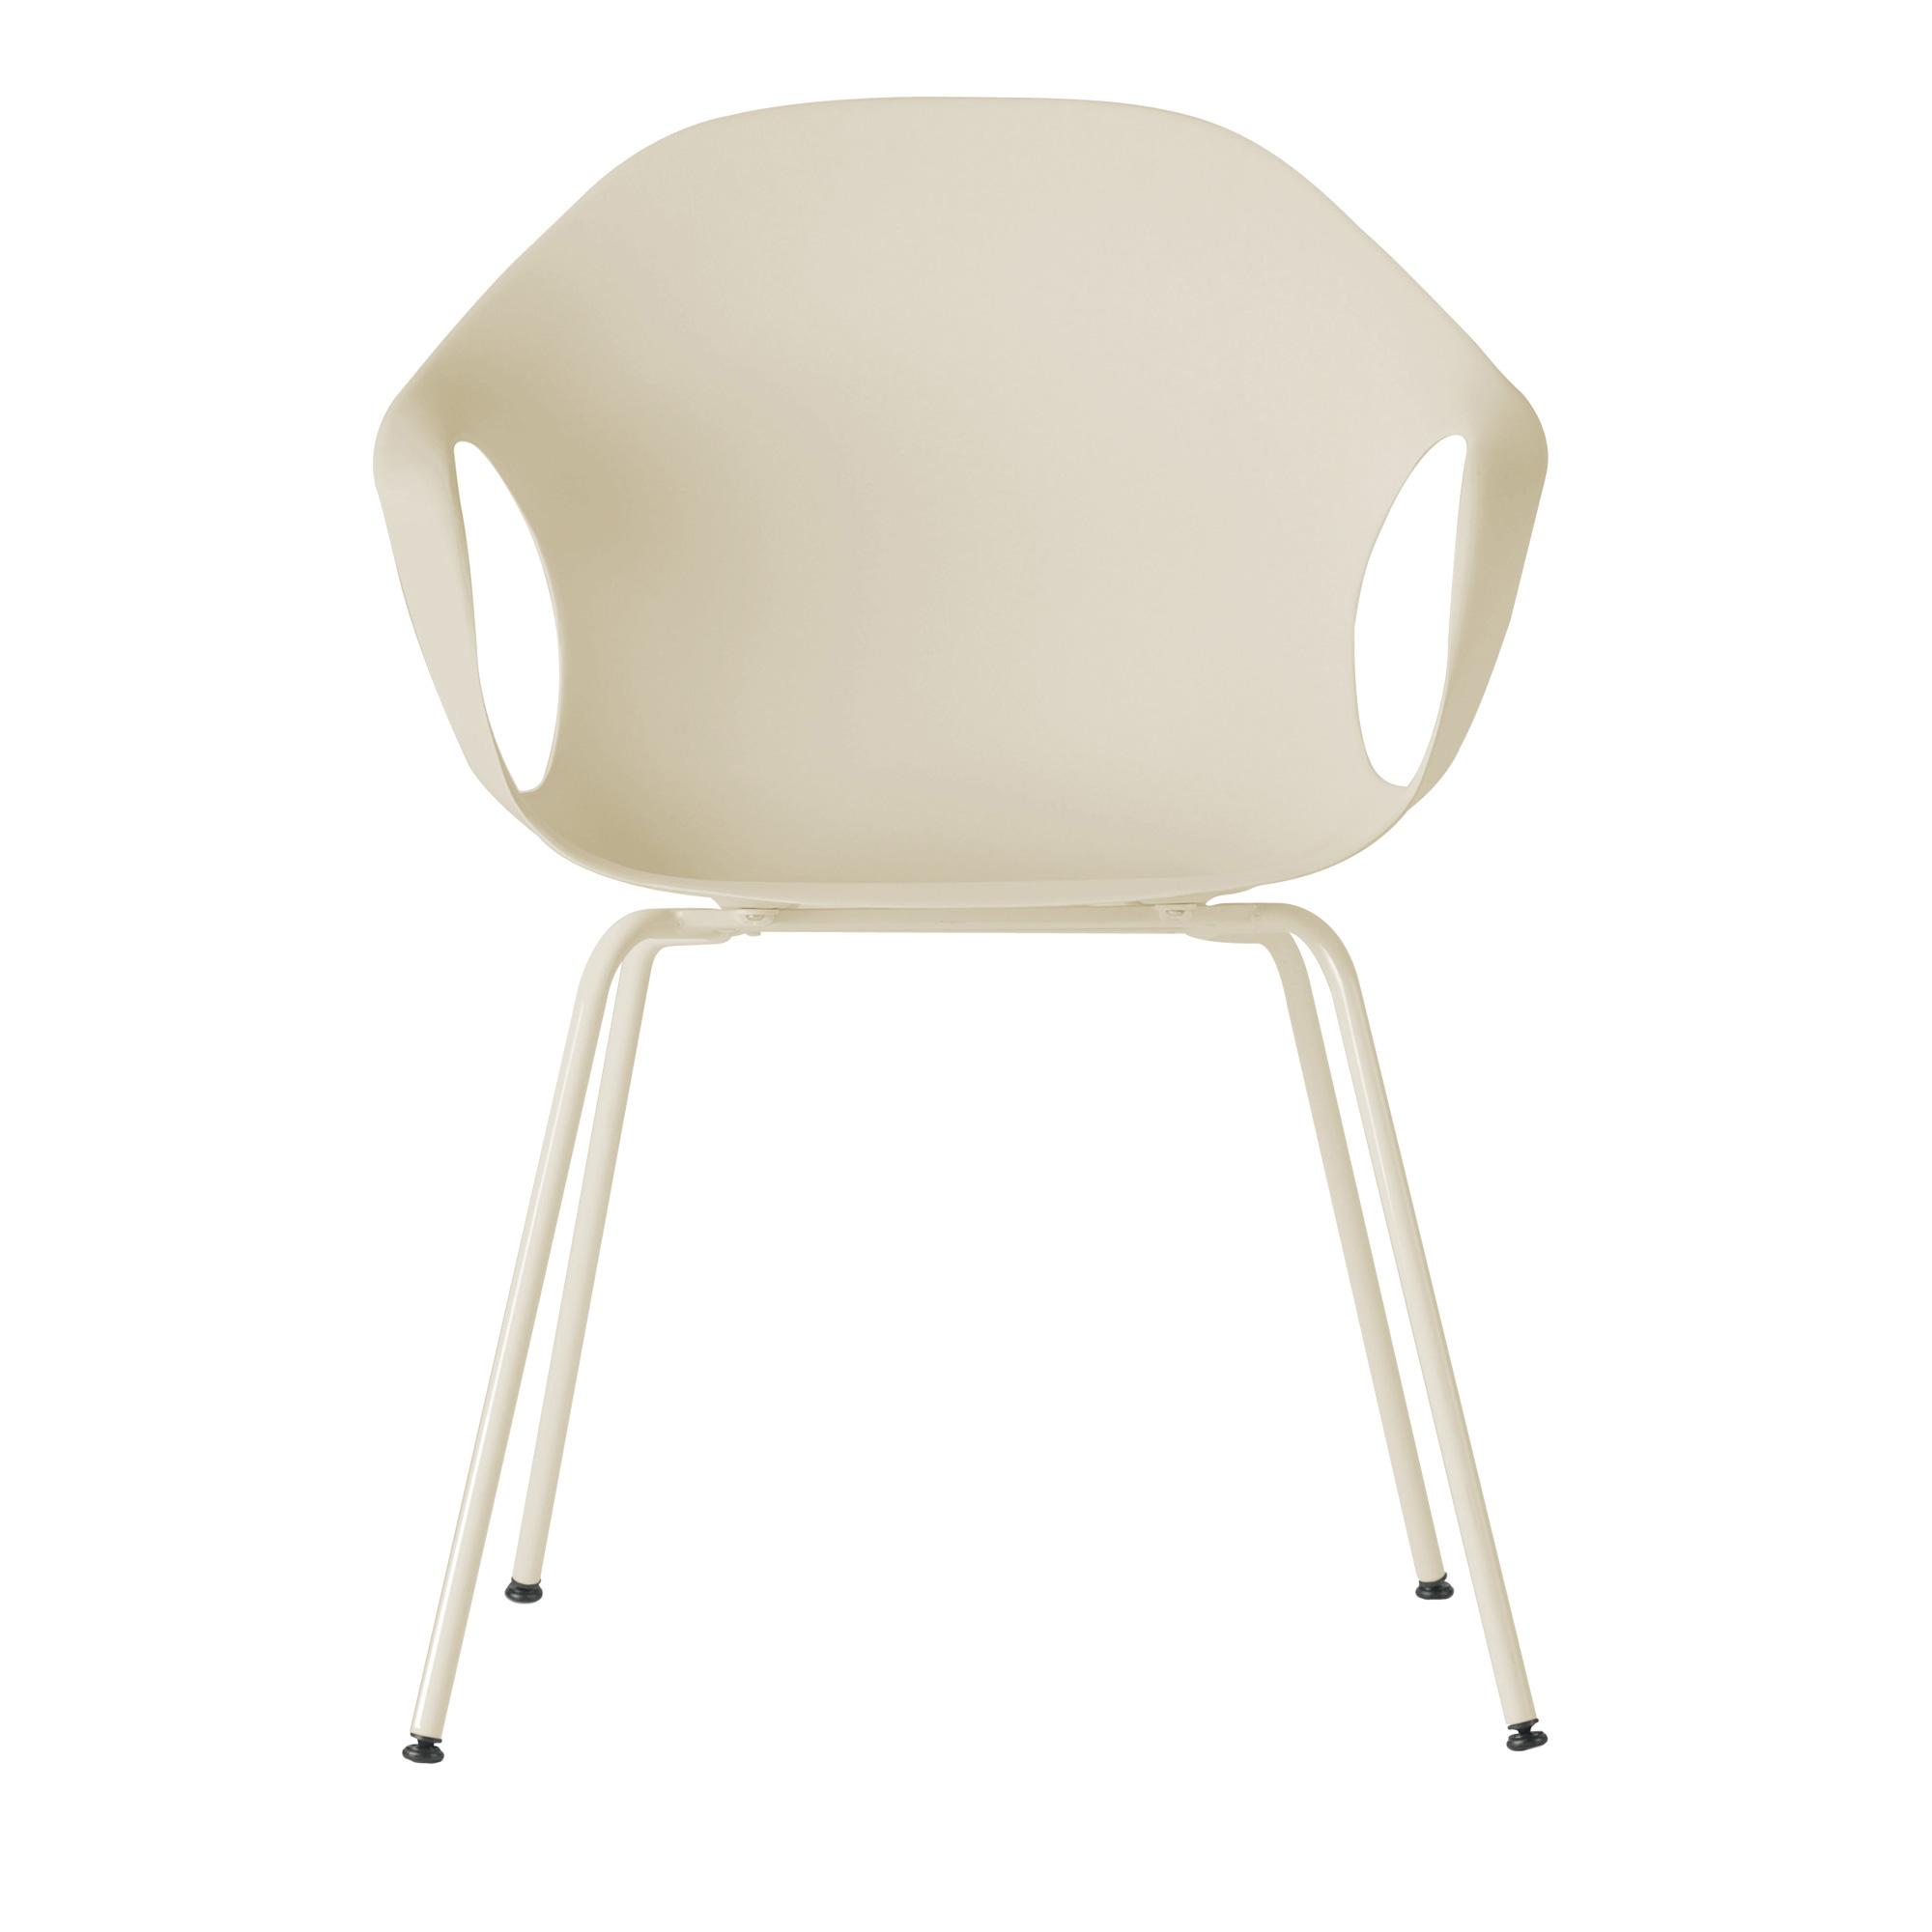 kristalia elephant sessel auf stahlbeinen 05ele11 beige. Black Bedroom Furniture Sets. Home Design Ideas